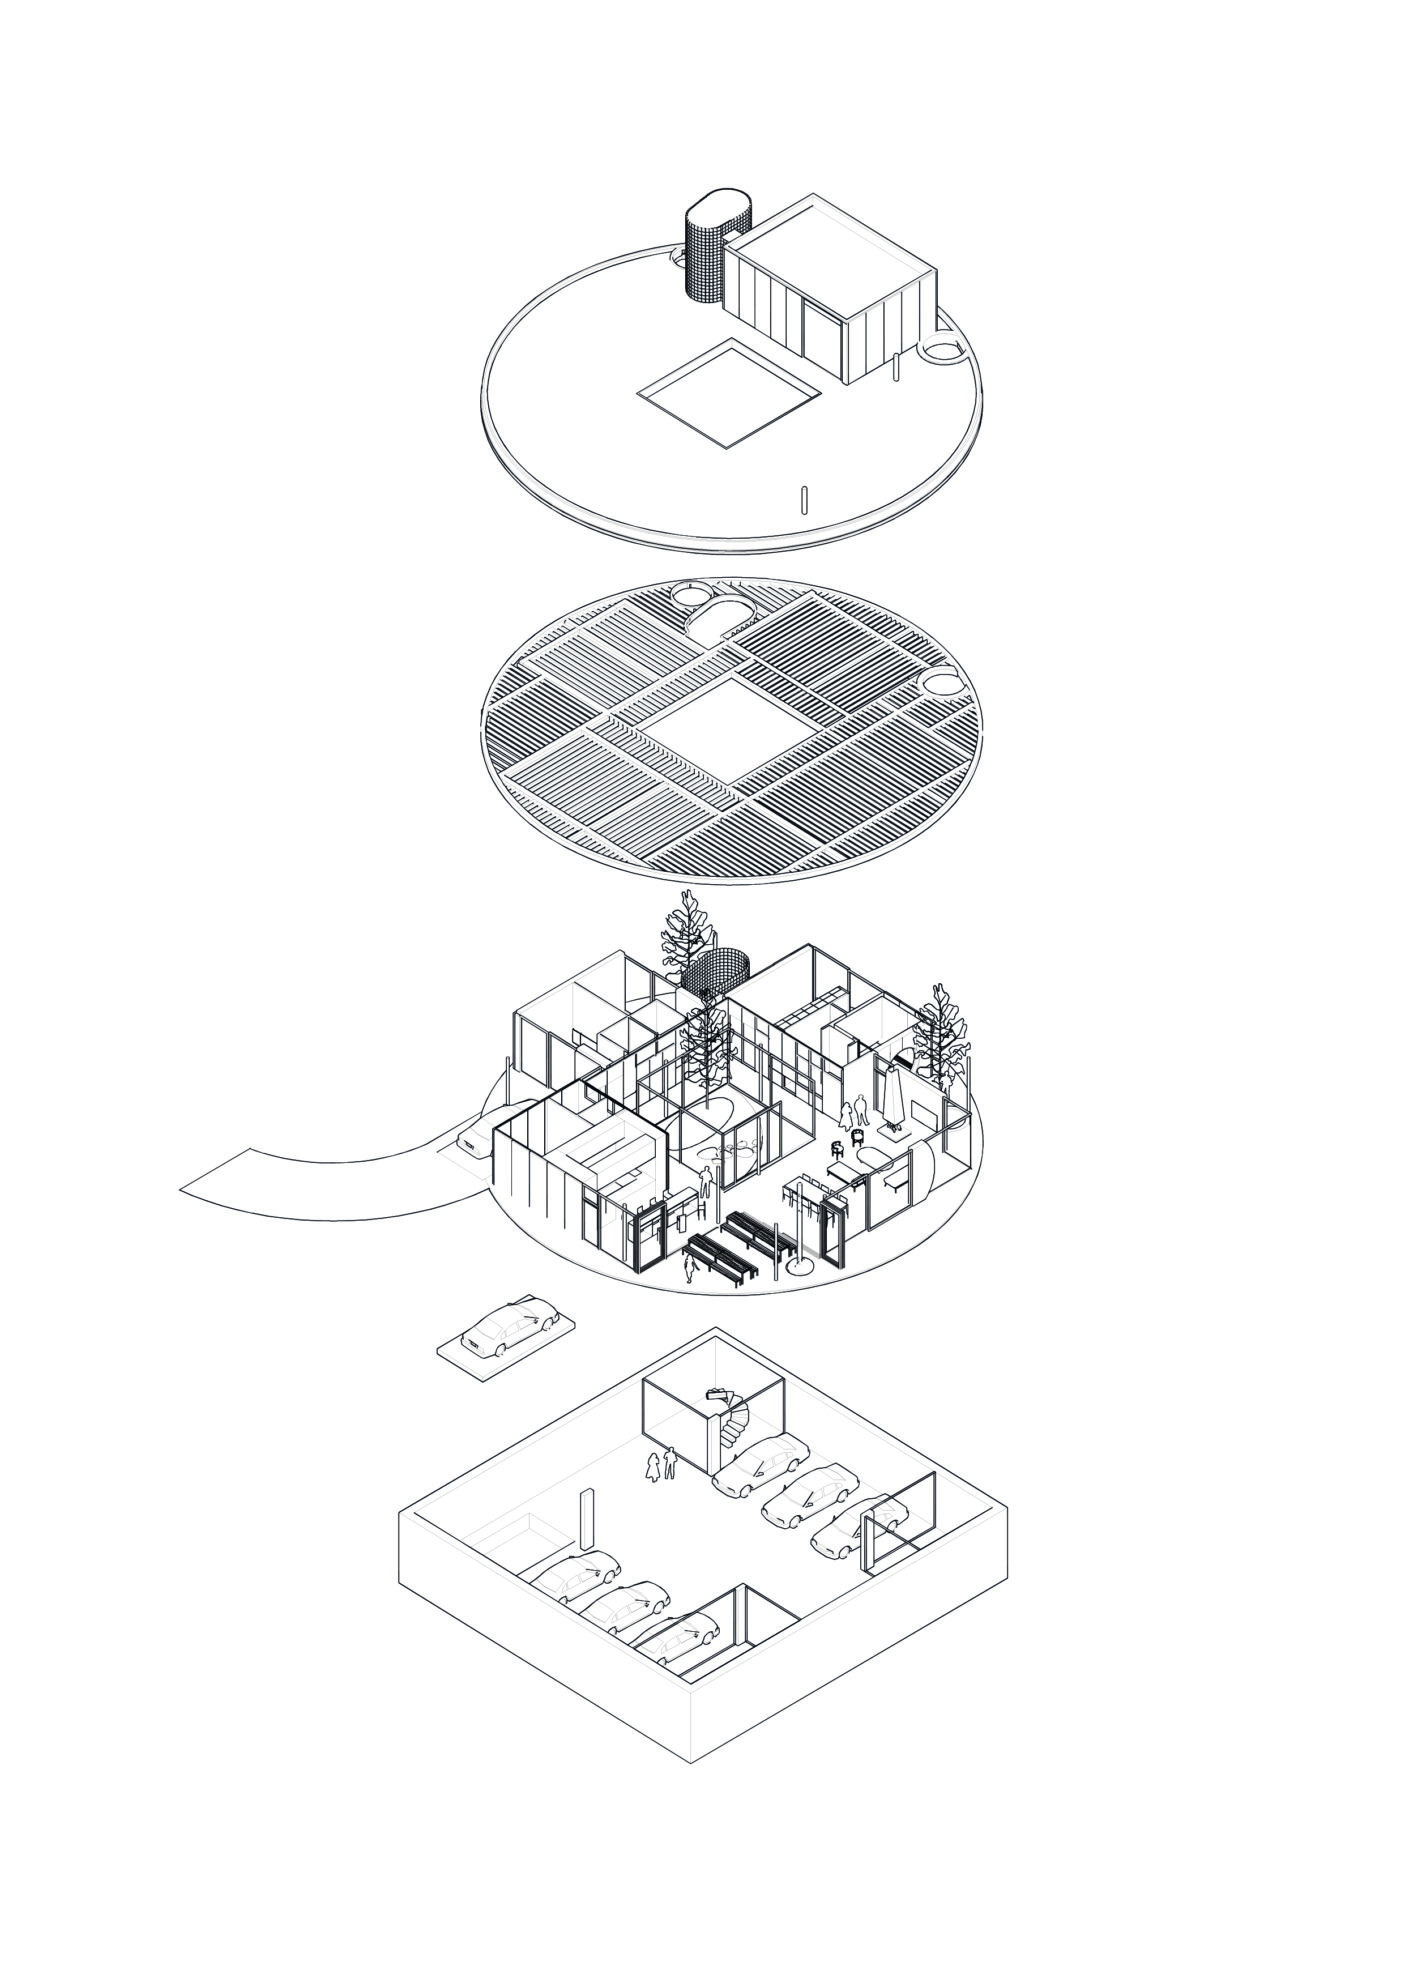 paviliion-axo_Tekengebied-1-scaled.jpg